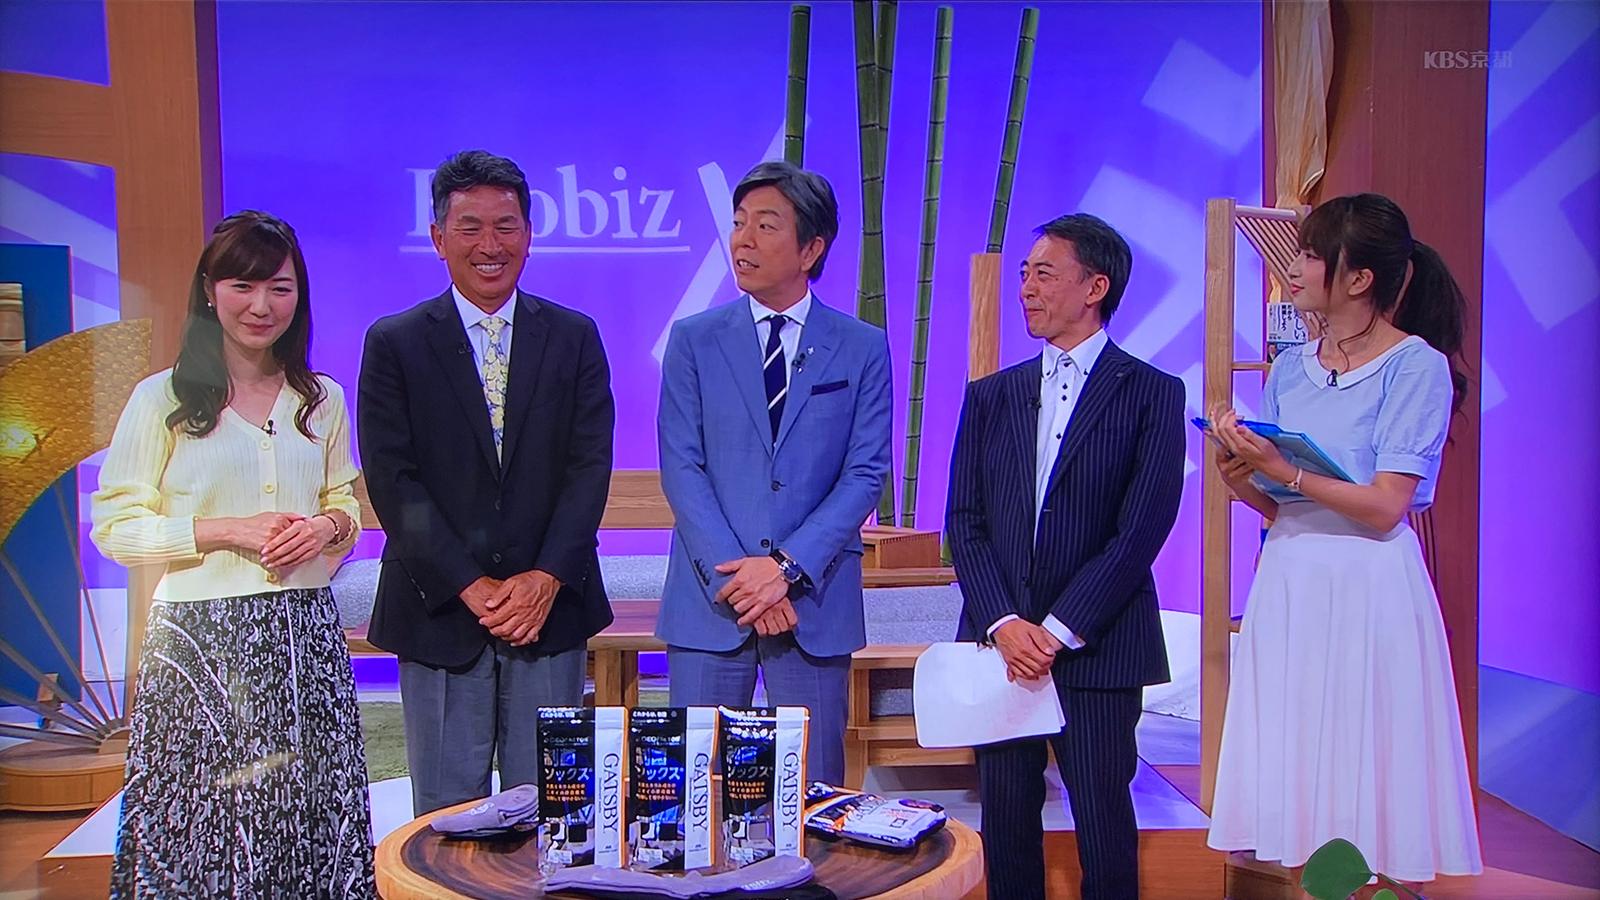 KBS京都『京BIZ』(2018/06/15)